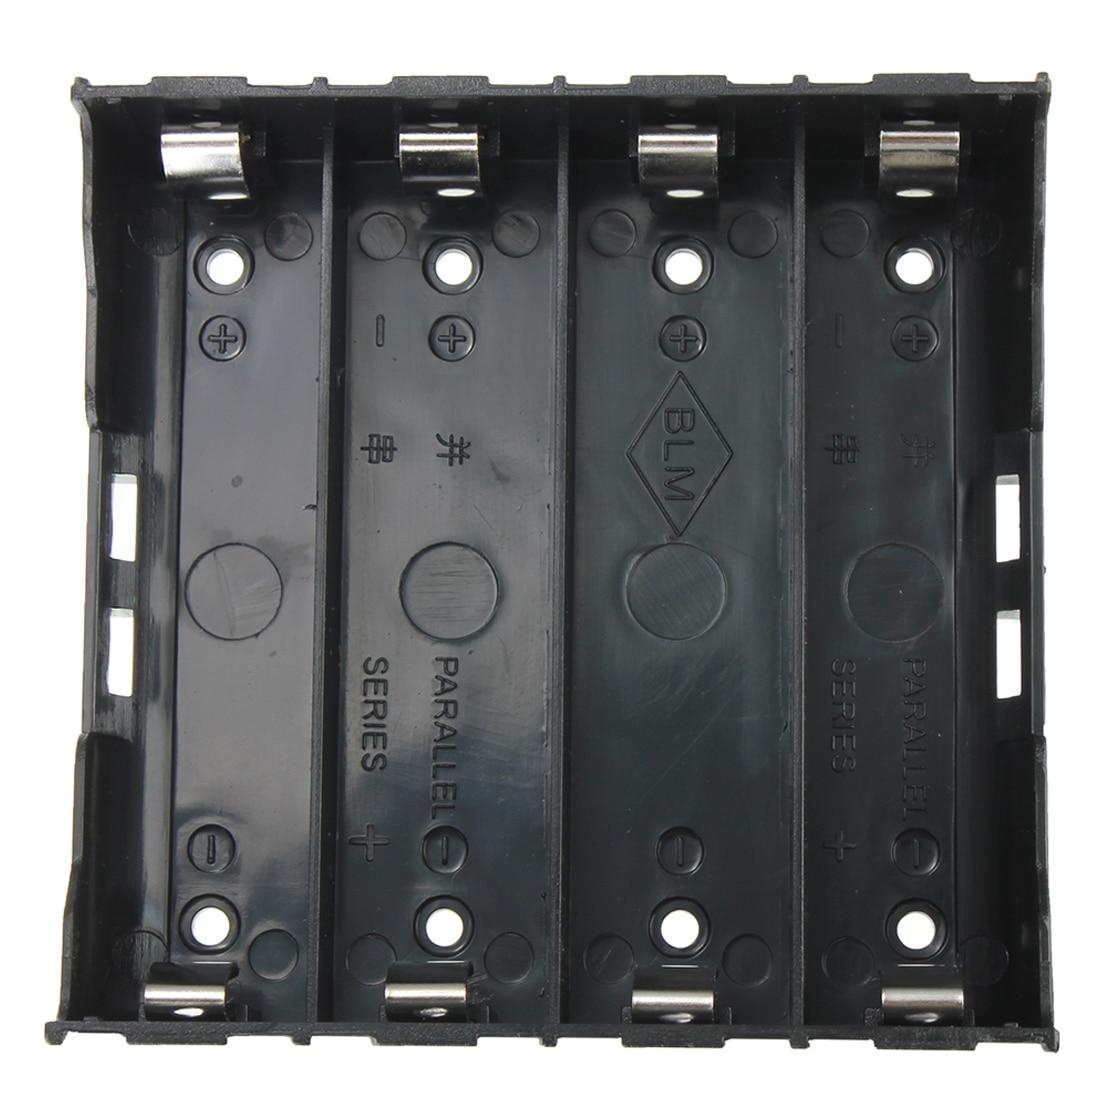 Top Deals 10x Battery Holder Box Case Black for 4x 13.7V 18650 Battery